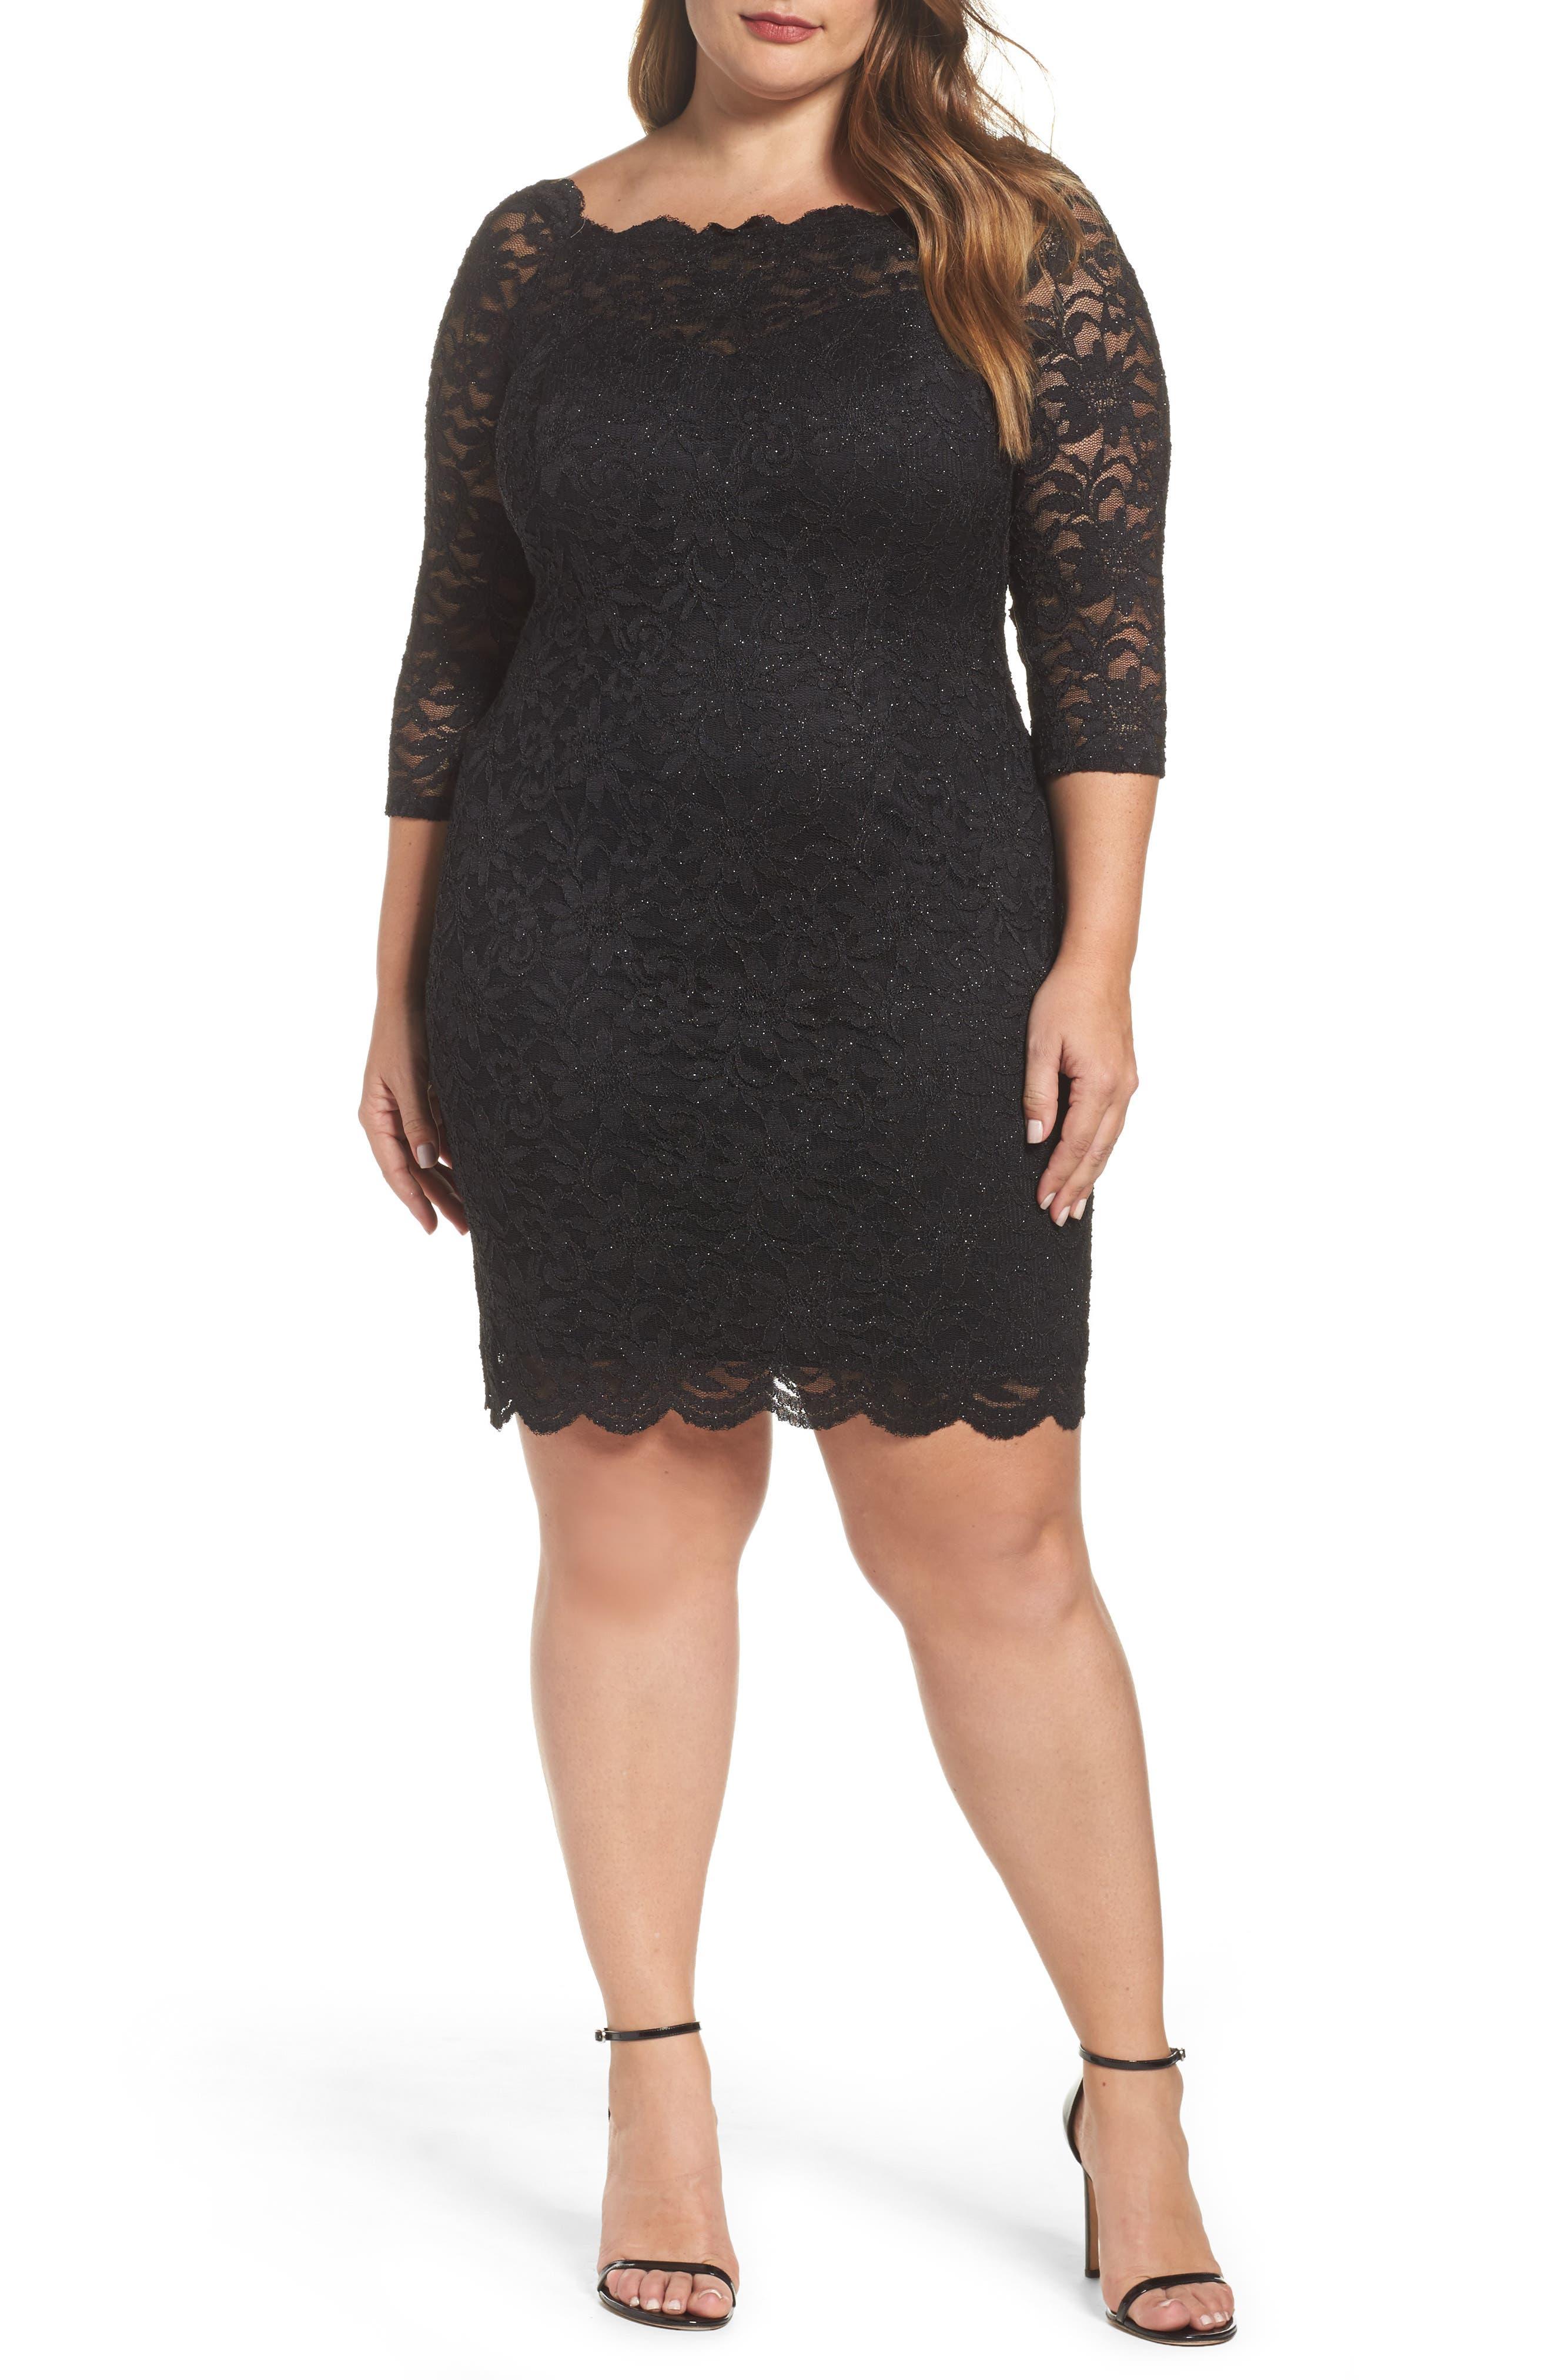 Glitter Lace Cocktail Dress,                             Main thumbnail 1, color,                             BLACK